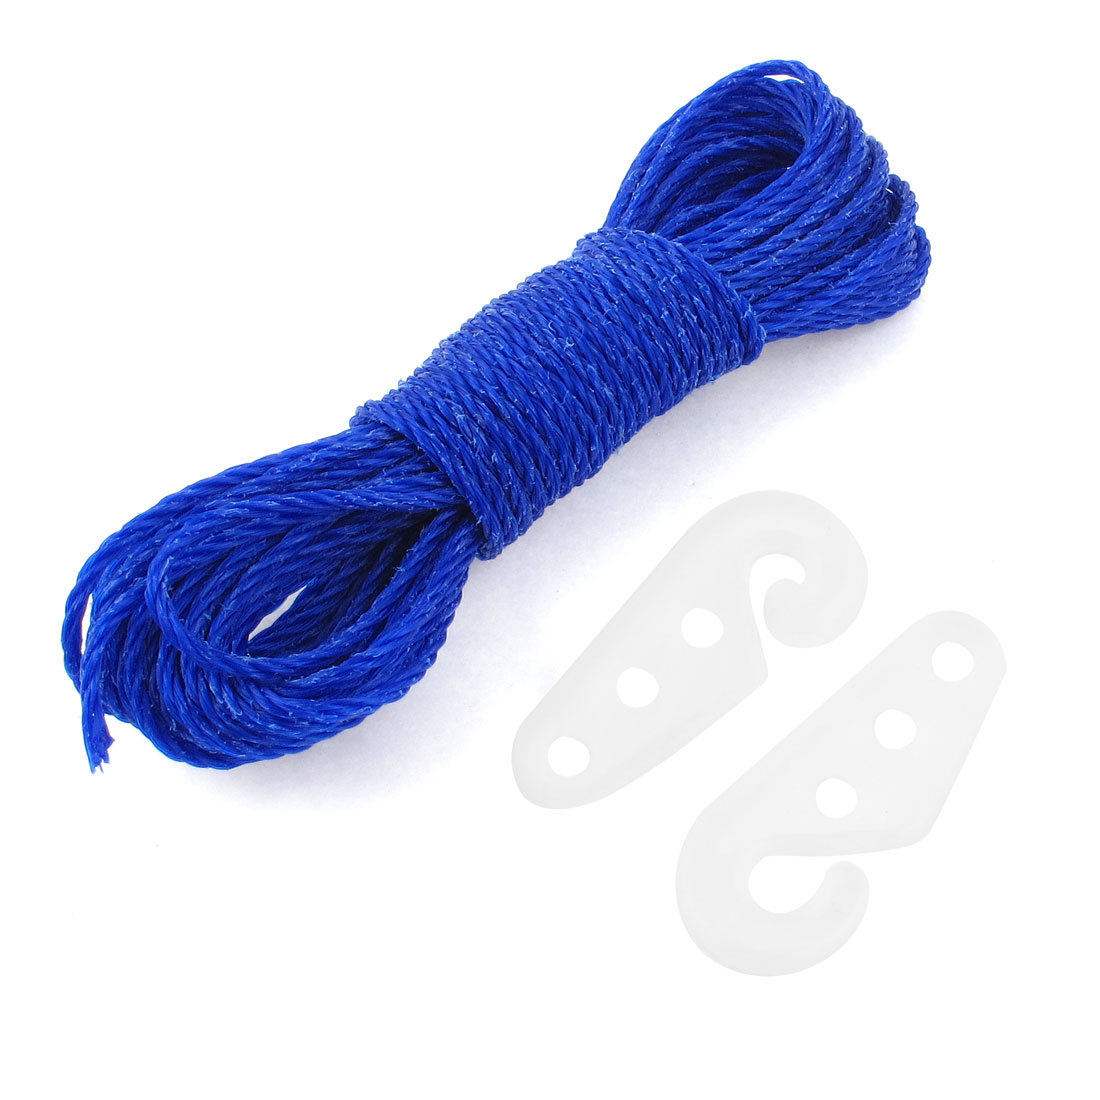 Blue Nylon Hanging Hanger Dual Hooks Clothes Rope String Washing Line 10M 33ft